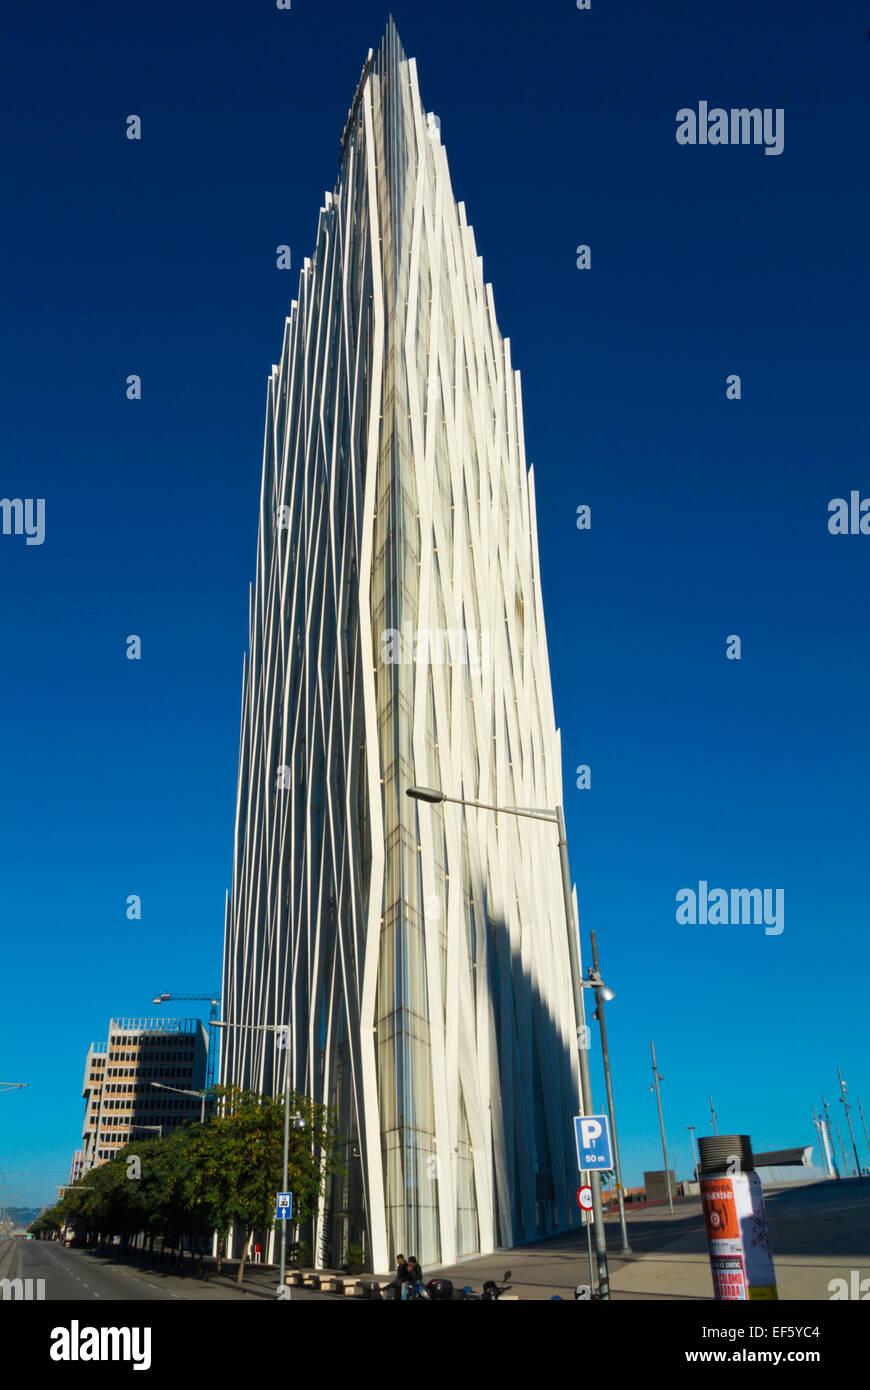 Edificio Torre Diagonal Zero Zero, la zona Fórum Diagonal Mar, distrito de Sant Marti, Barcelona, España Imagen De Stock